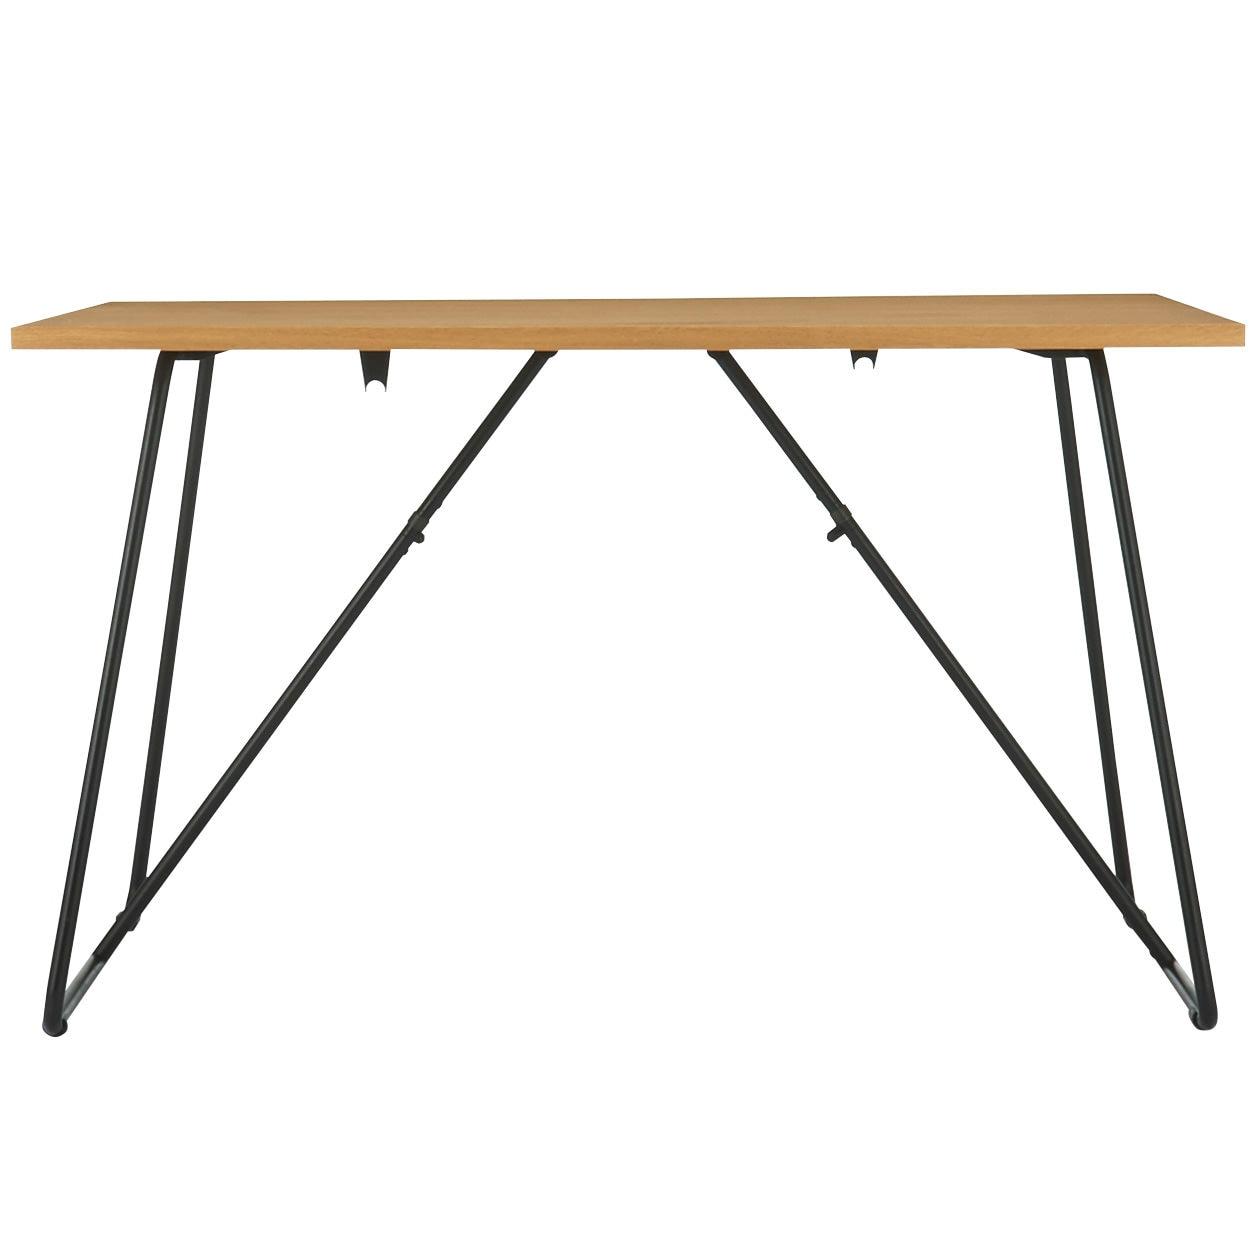 RoomClip商品情報 - 折りたたみテーブル・幅120cm・オーク材